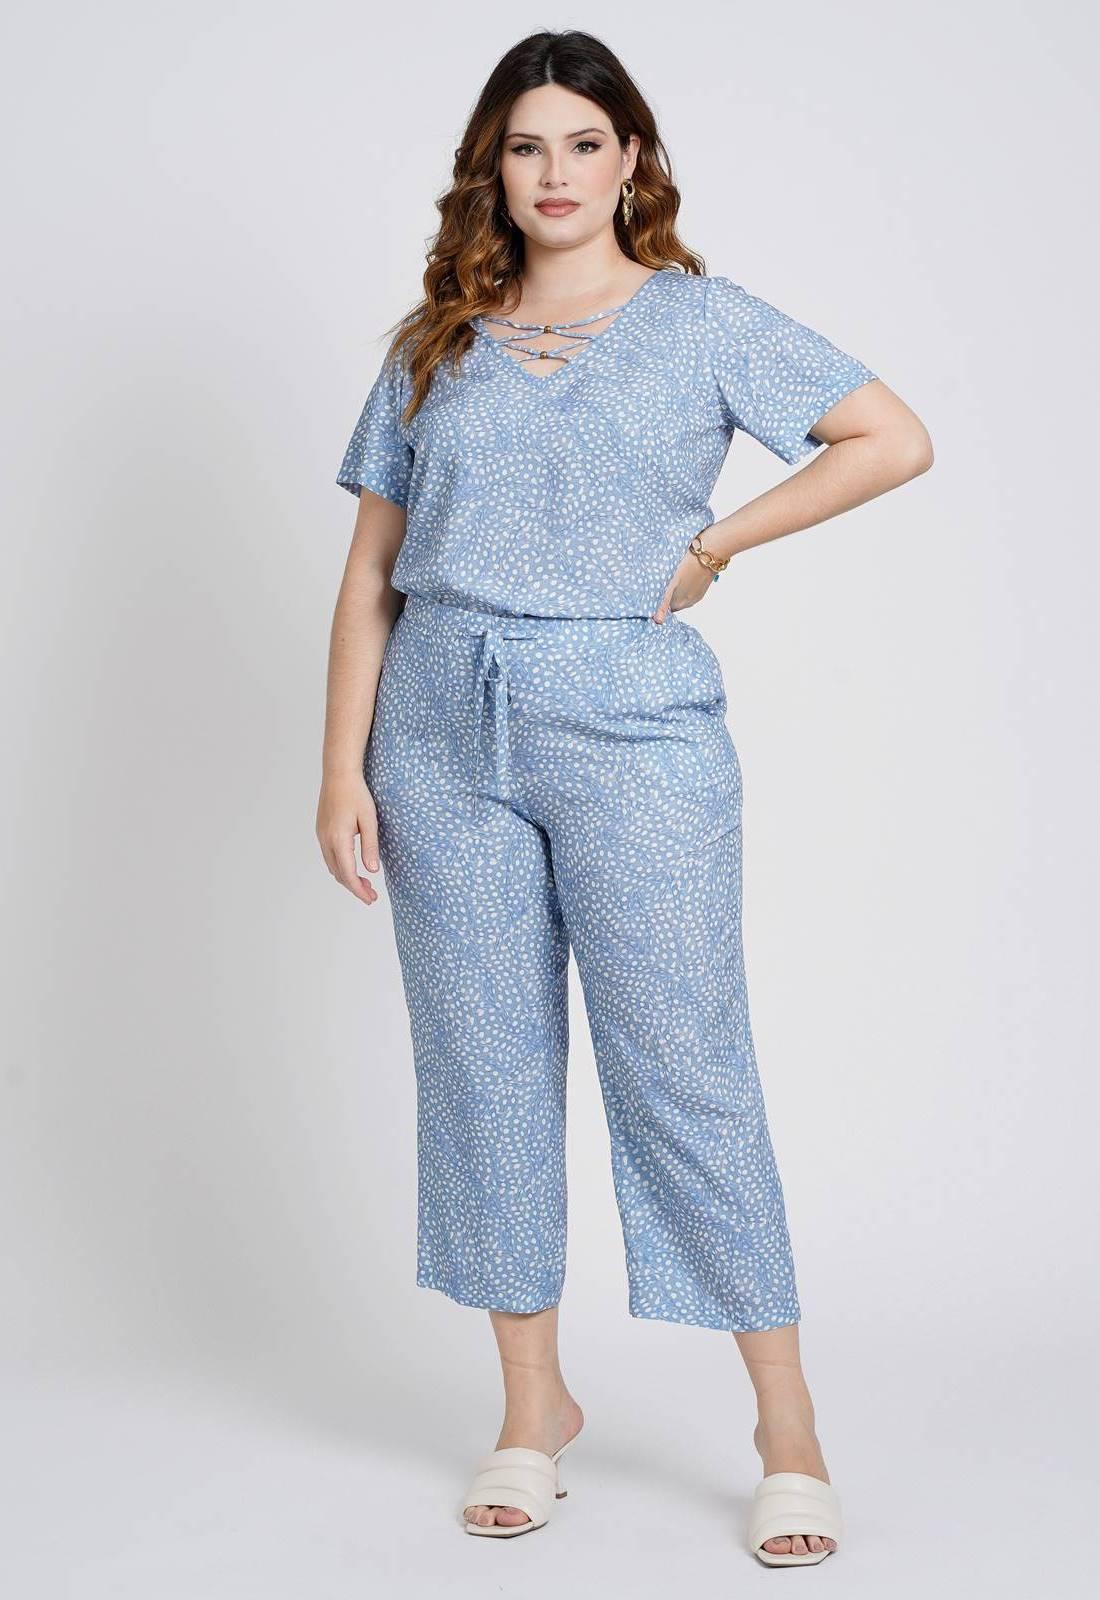 Conjunto plus size pantacourt blusa e calça AZUL Ref. U82221